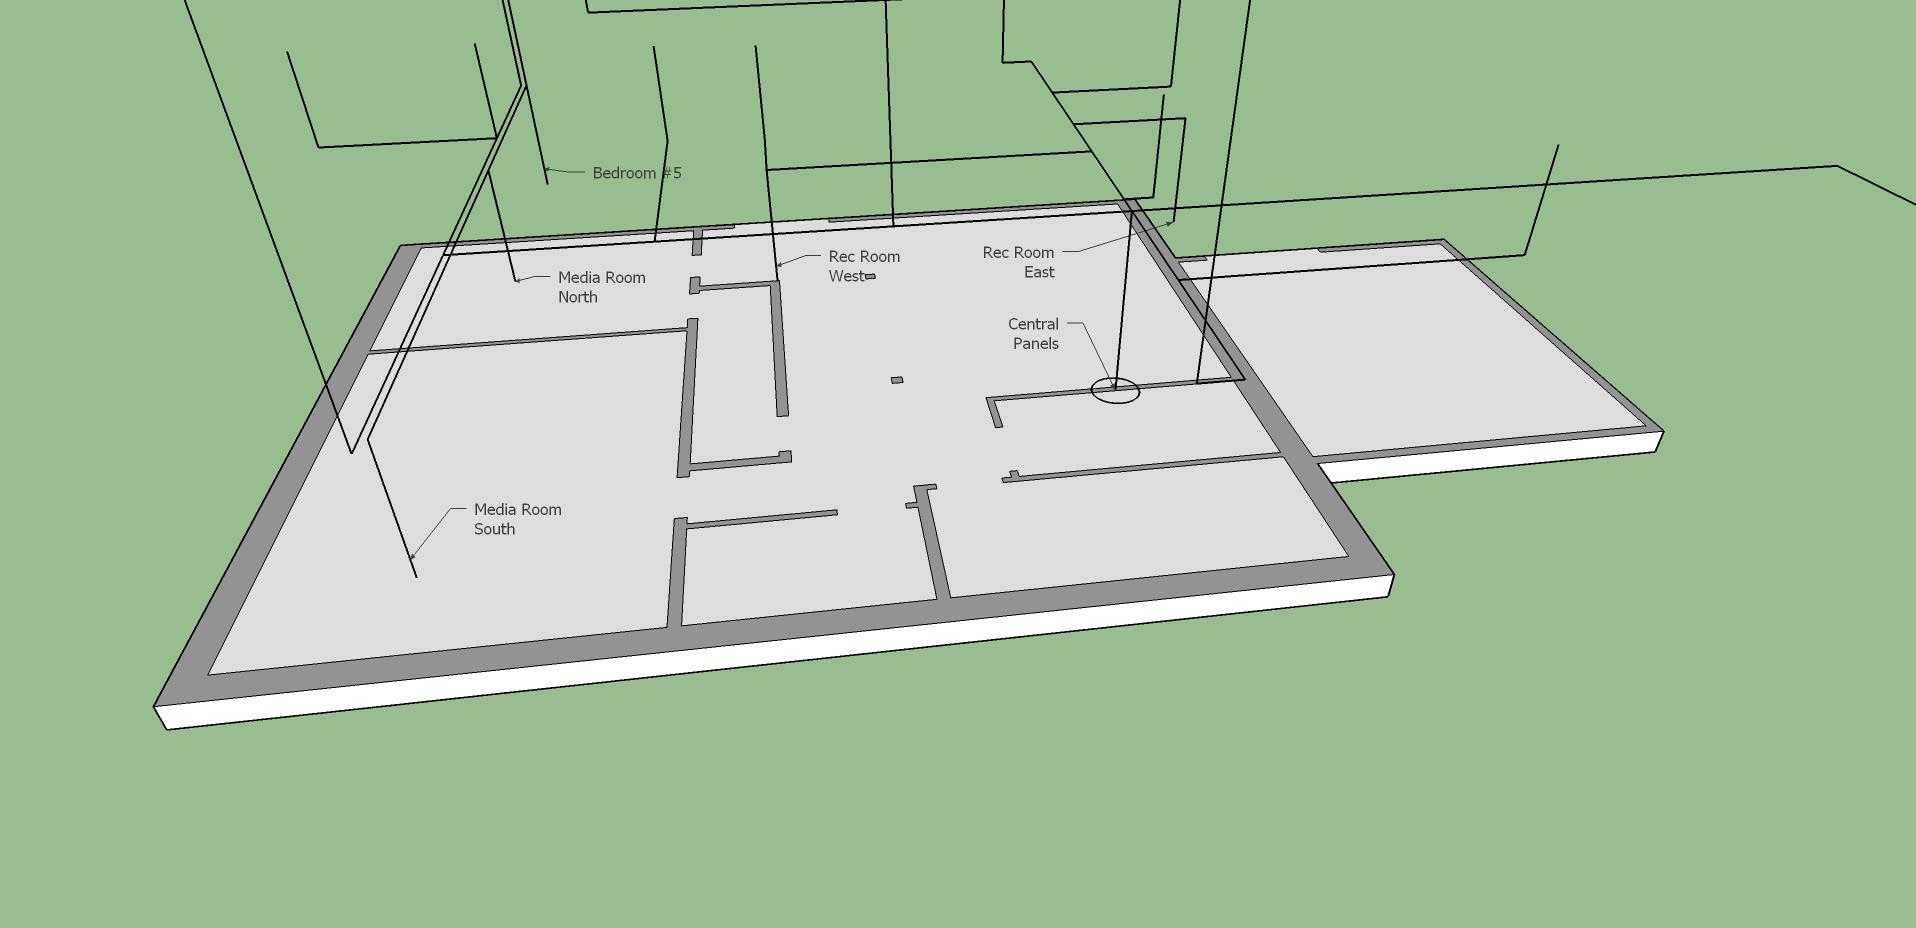 low voltage wiring diagram basement [ 1916 x 928 Pixel ]